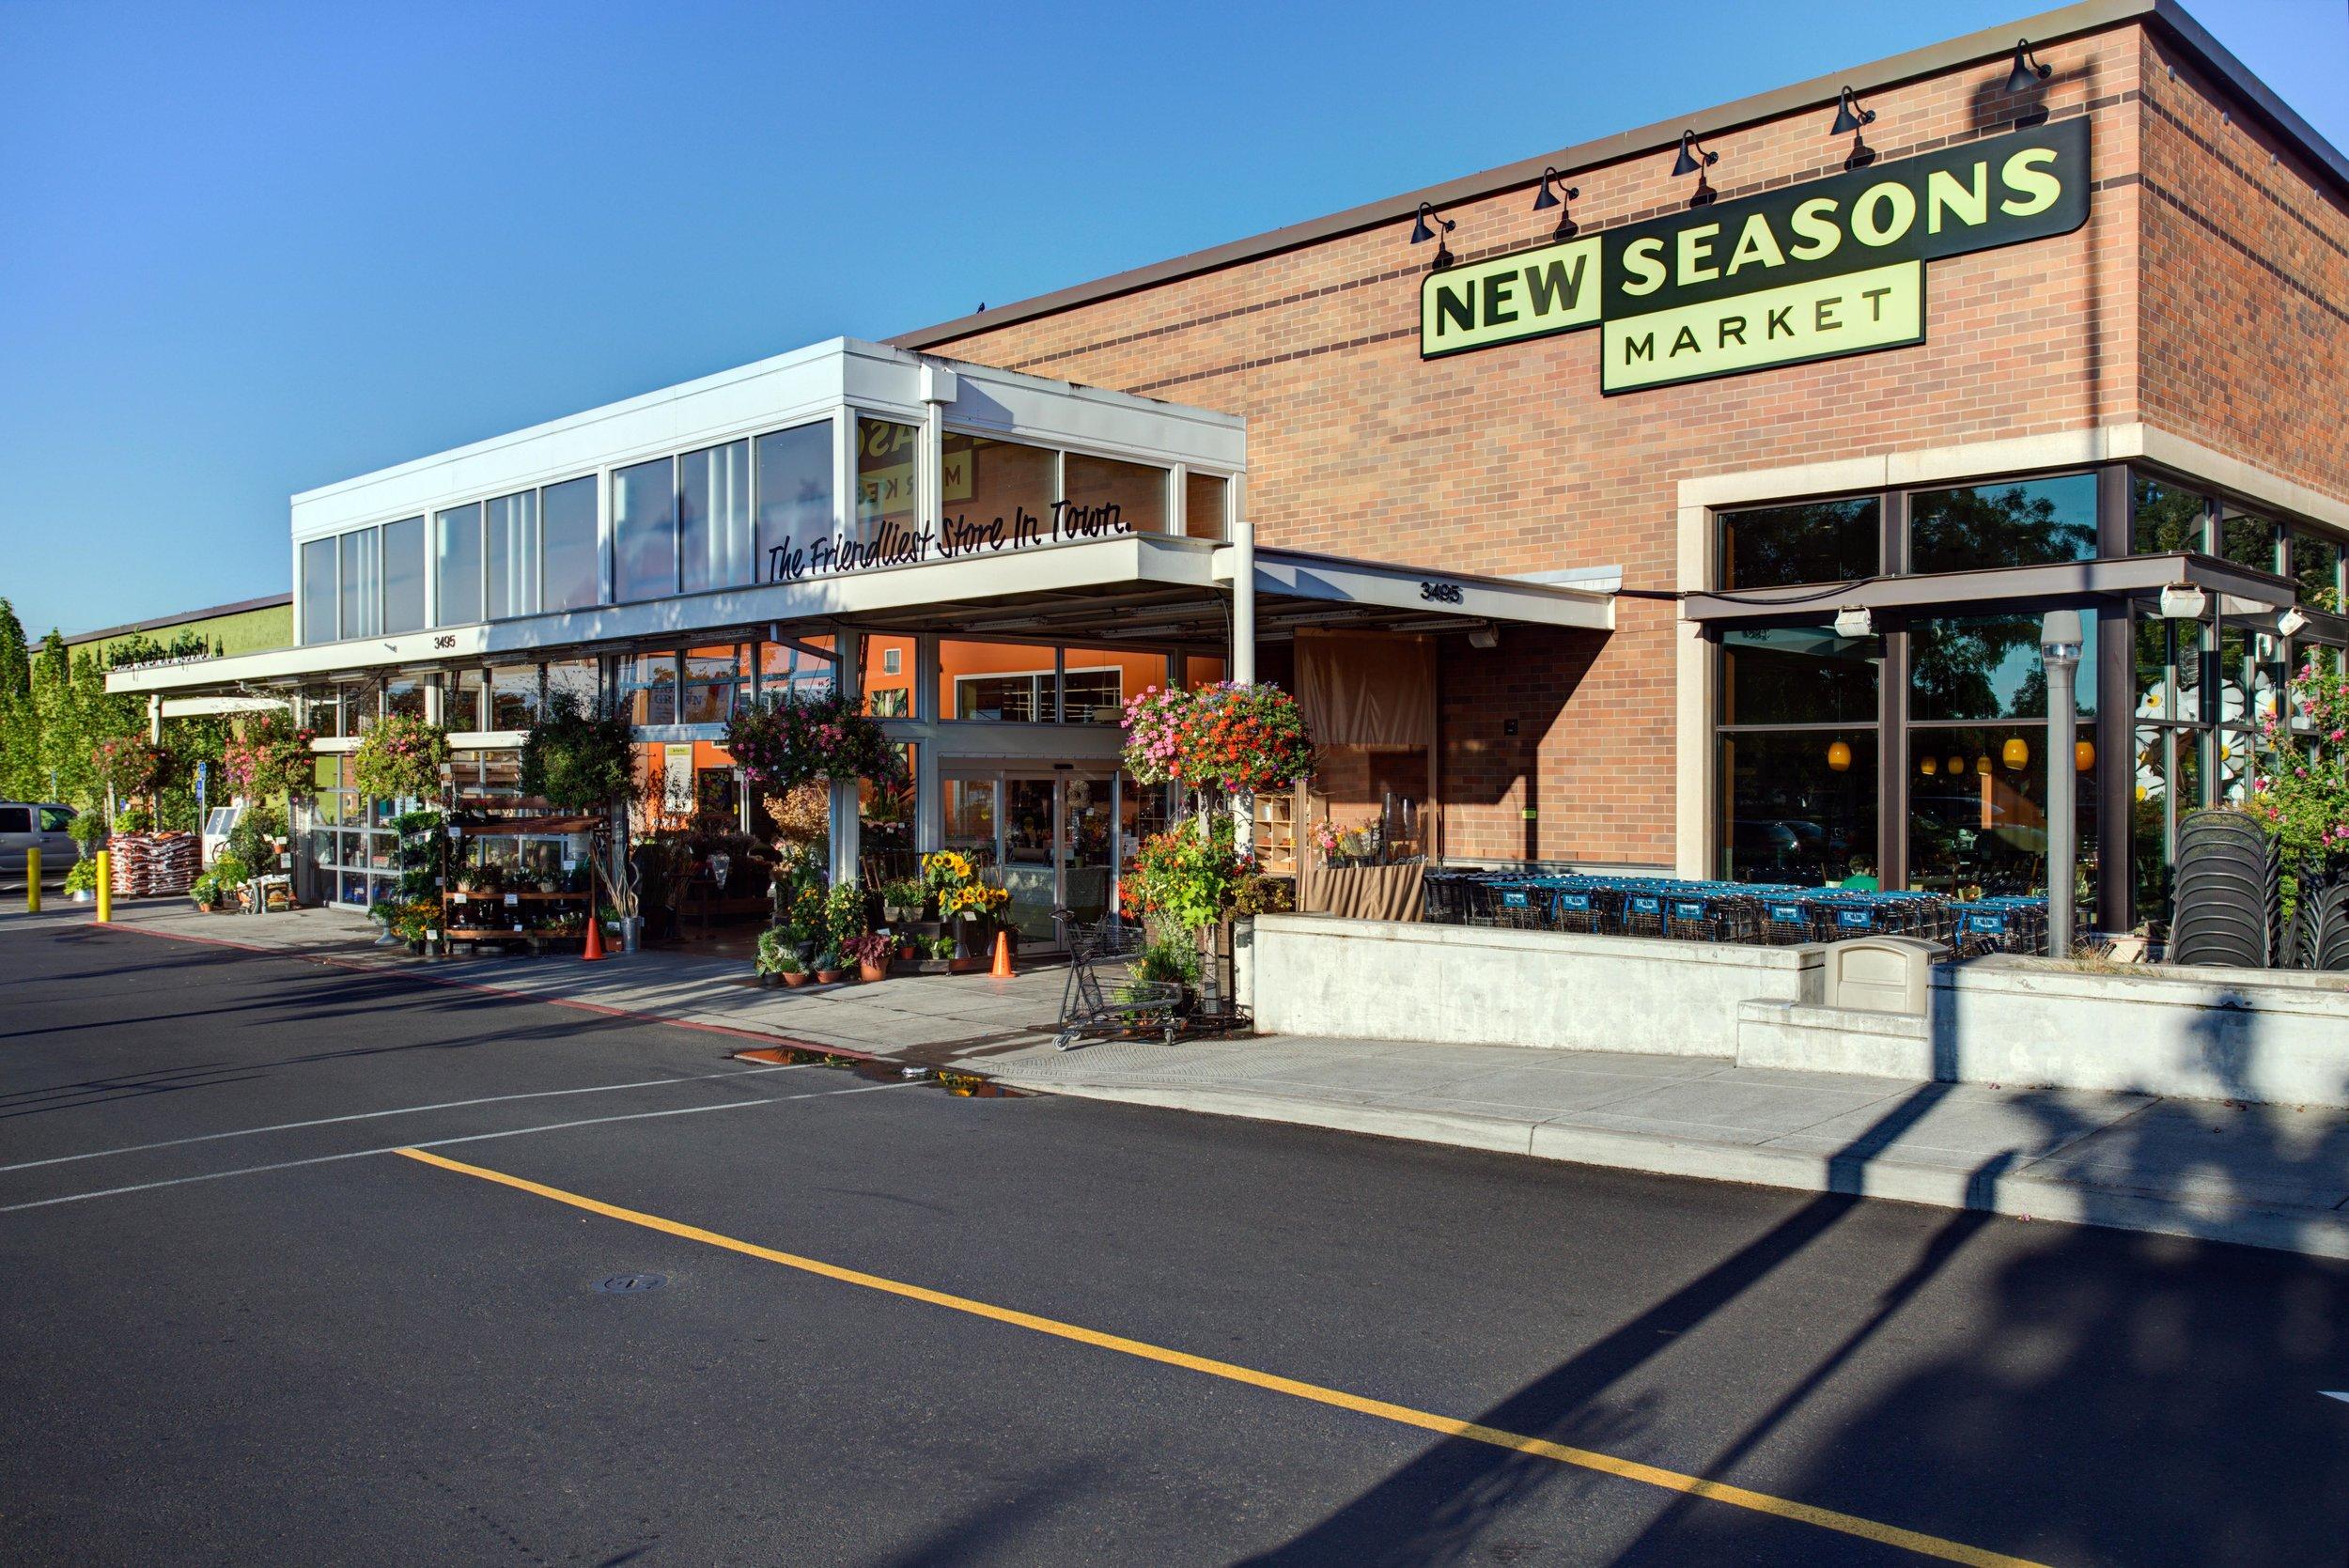 Cedar Hills New Seasons Market. Beaverton, Oregon